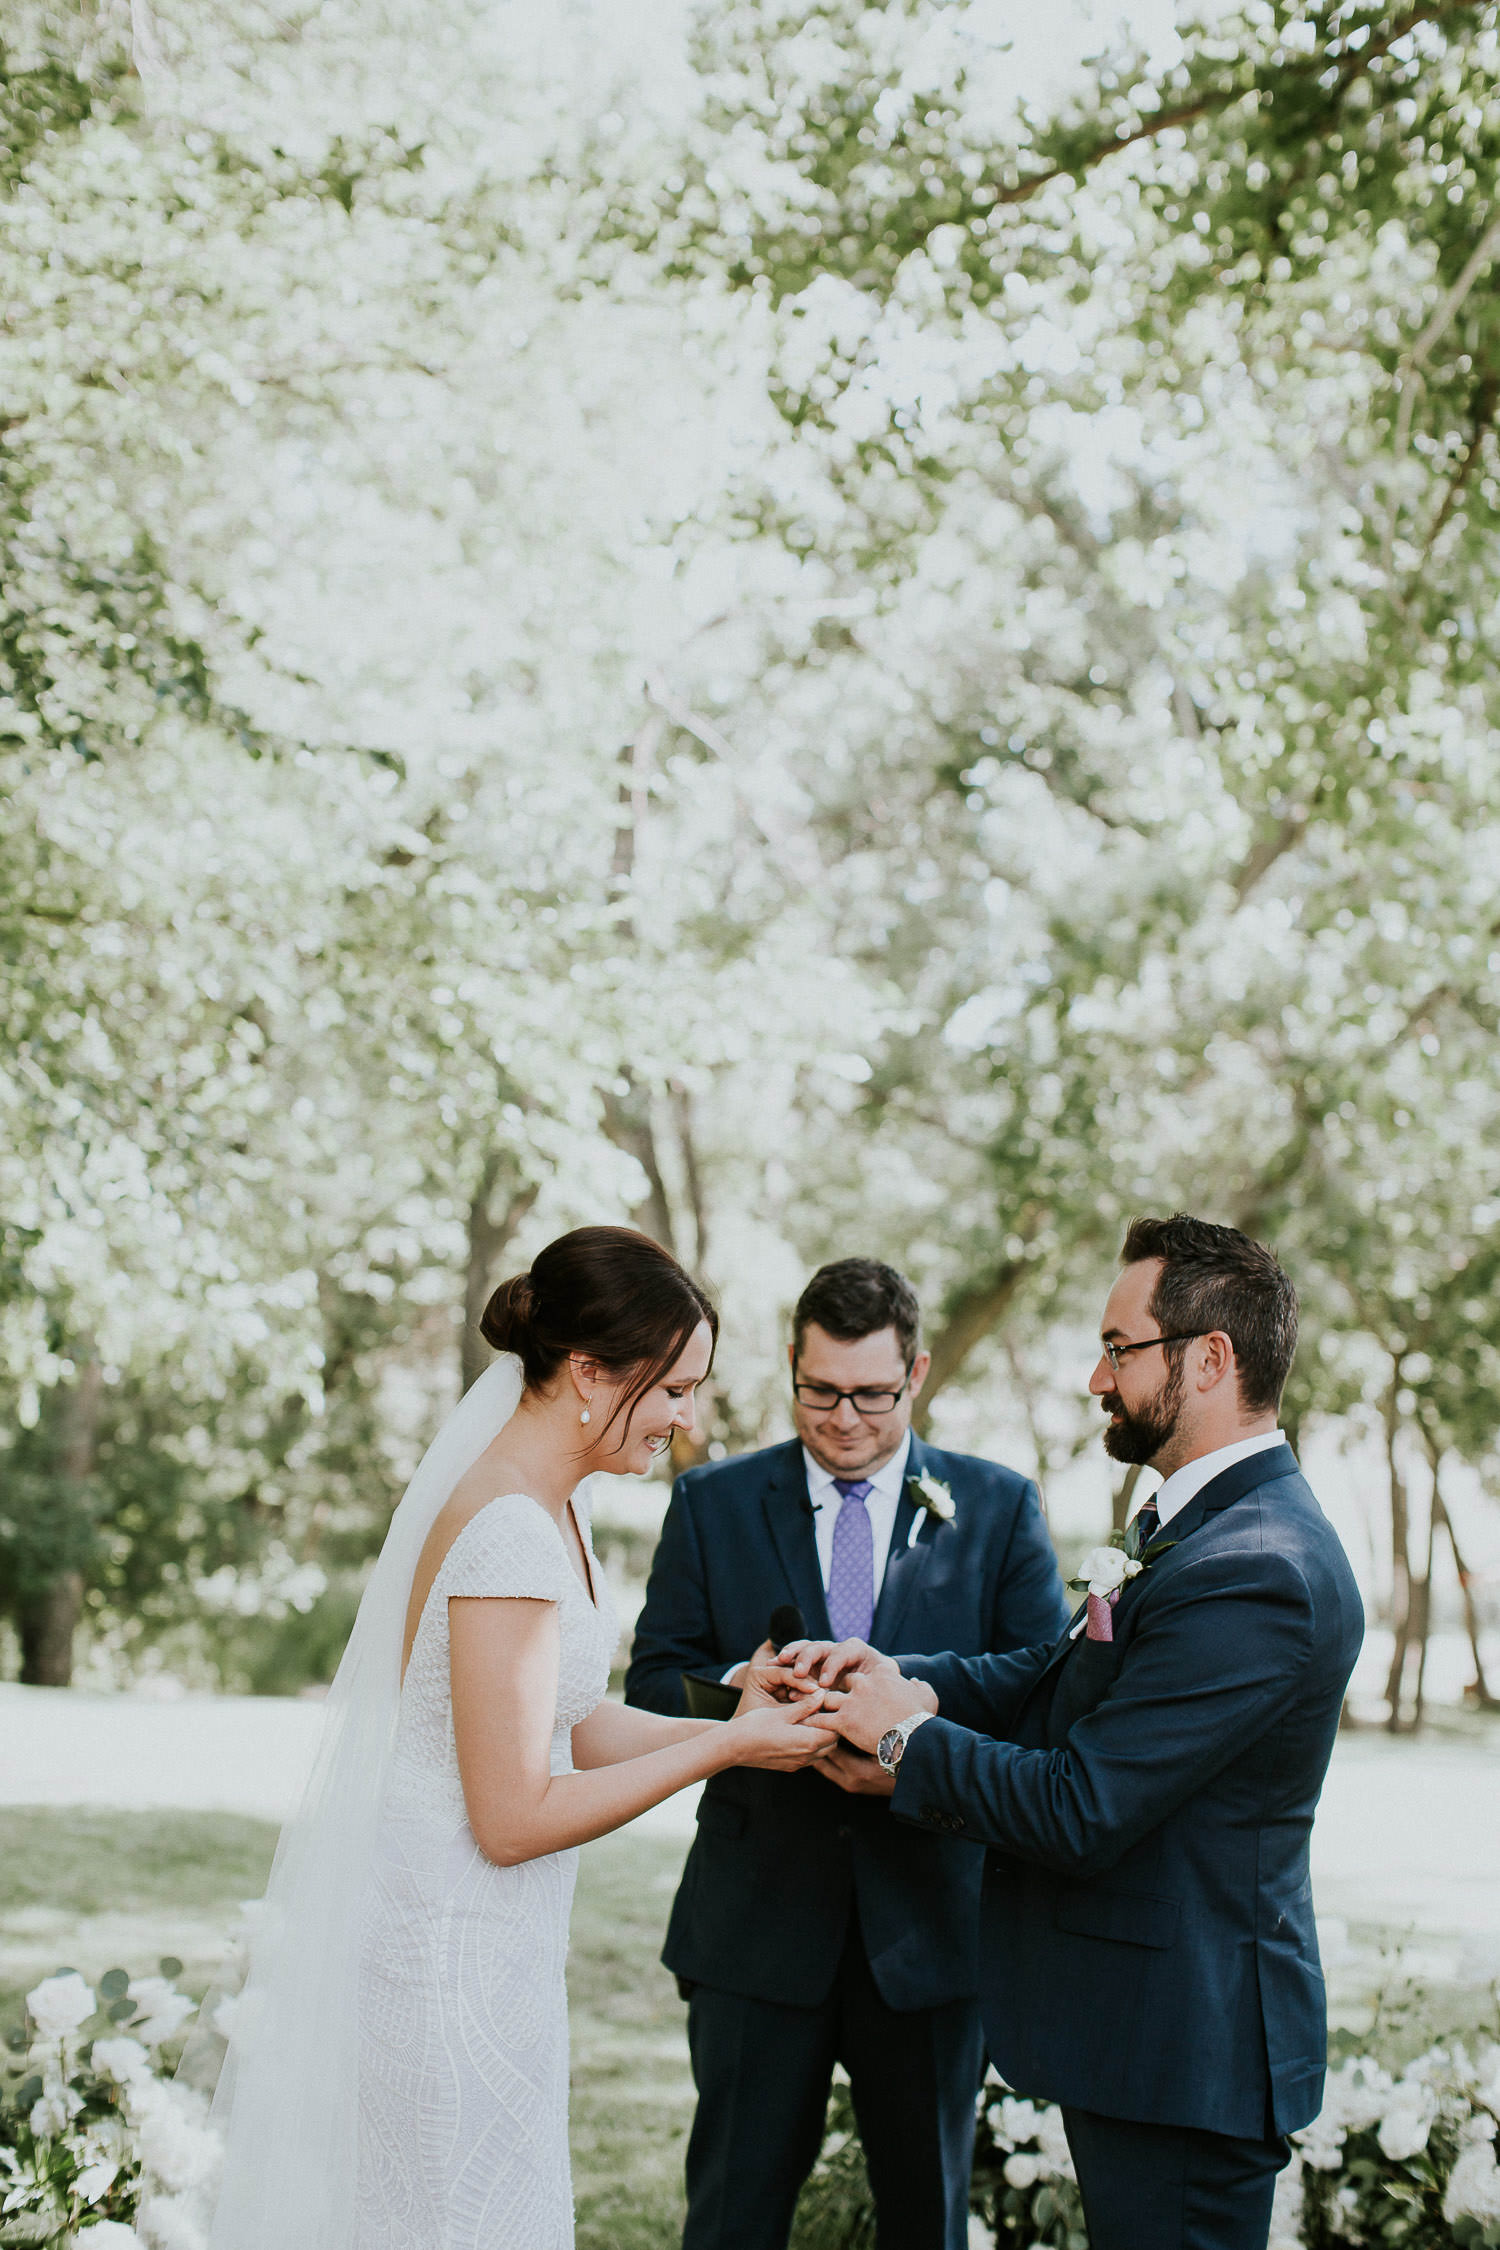 summer-backyard-wedding-in-alberta-sarah-pukin-0112